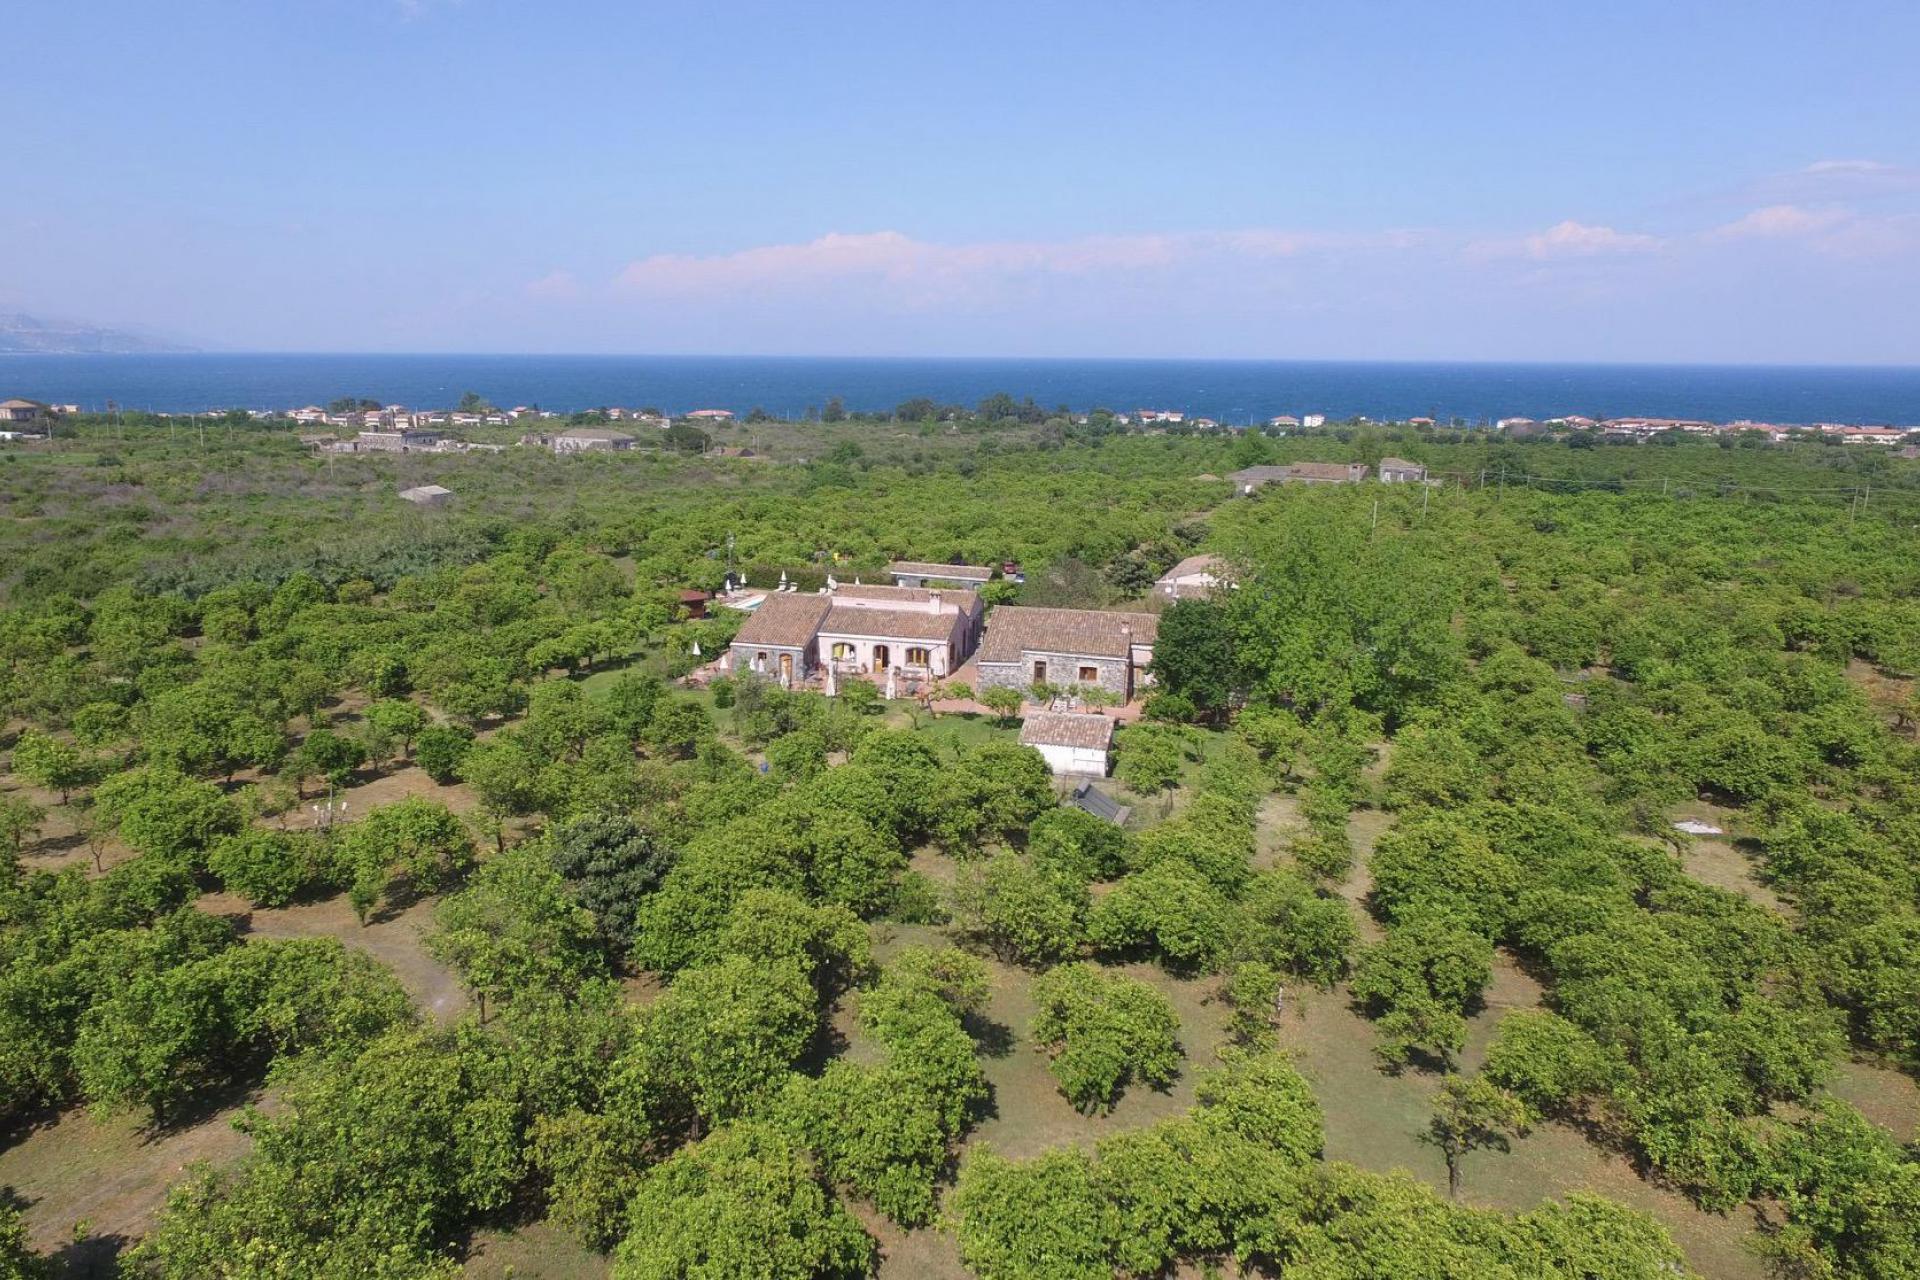 Agriturismo Sicilia Agriturismo immerso tra alberi di agrumi in Sicilia